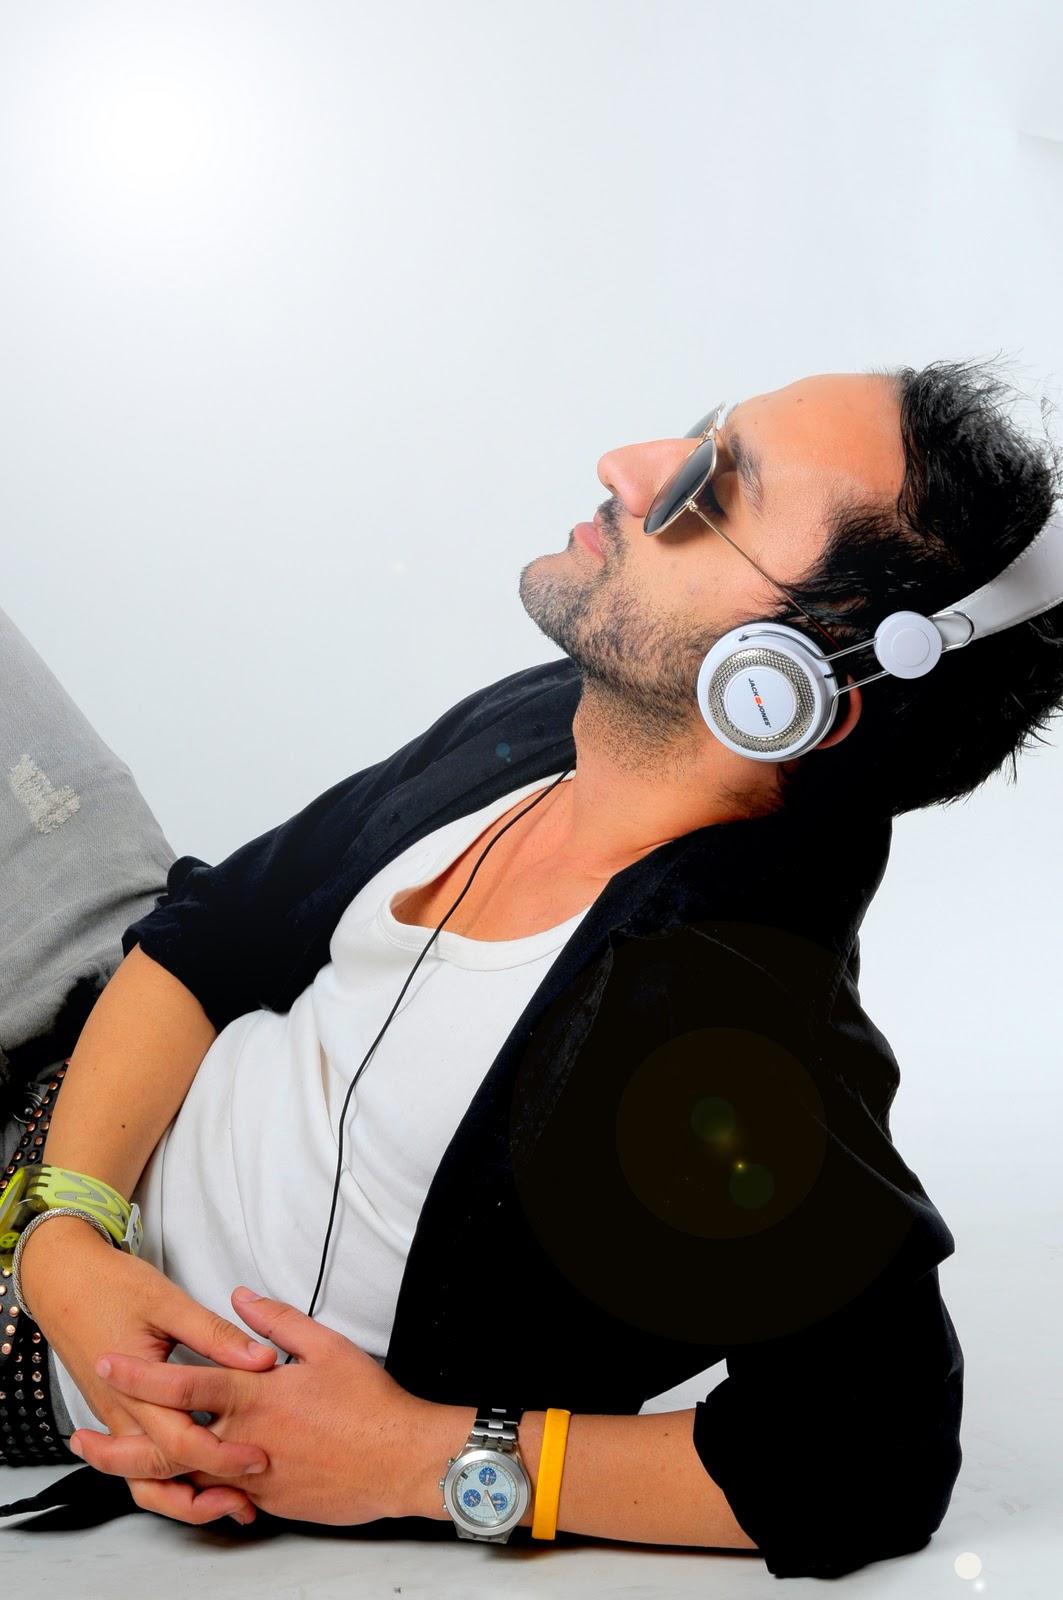 http://3.bp.blogspot.com/-v_CHPNYLZtI/Tt92D63eSDI/AAAAAAAAIhs/EAgysEvt9bs/s1600/Carlos+N%25C3%25B3brega+Promo+Pic+Pitiful+%25283%2529.jpg